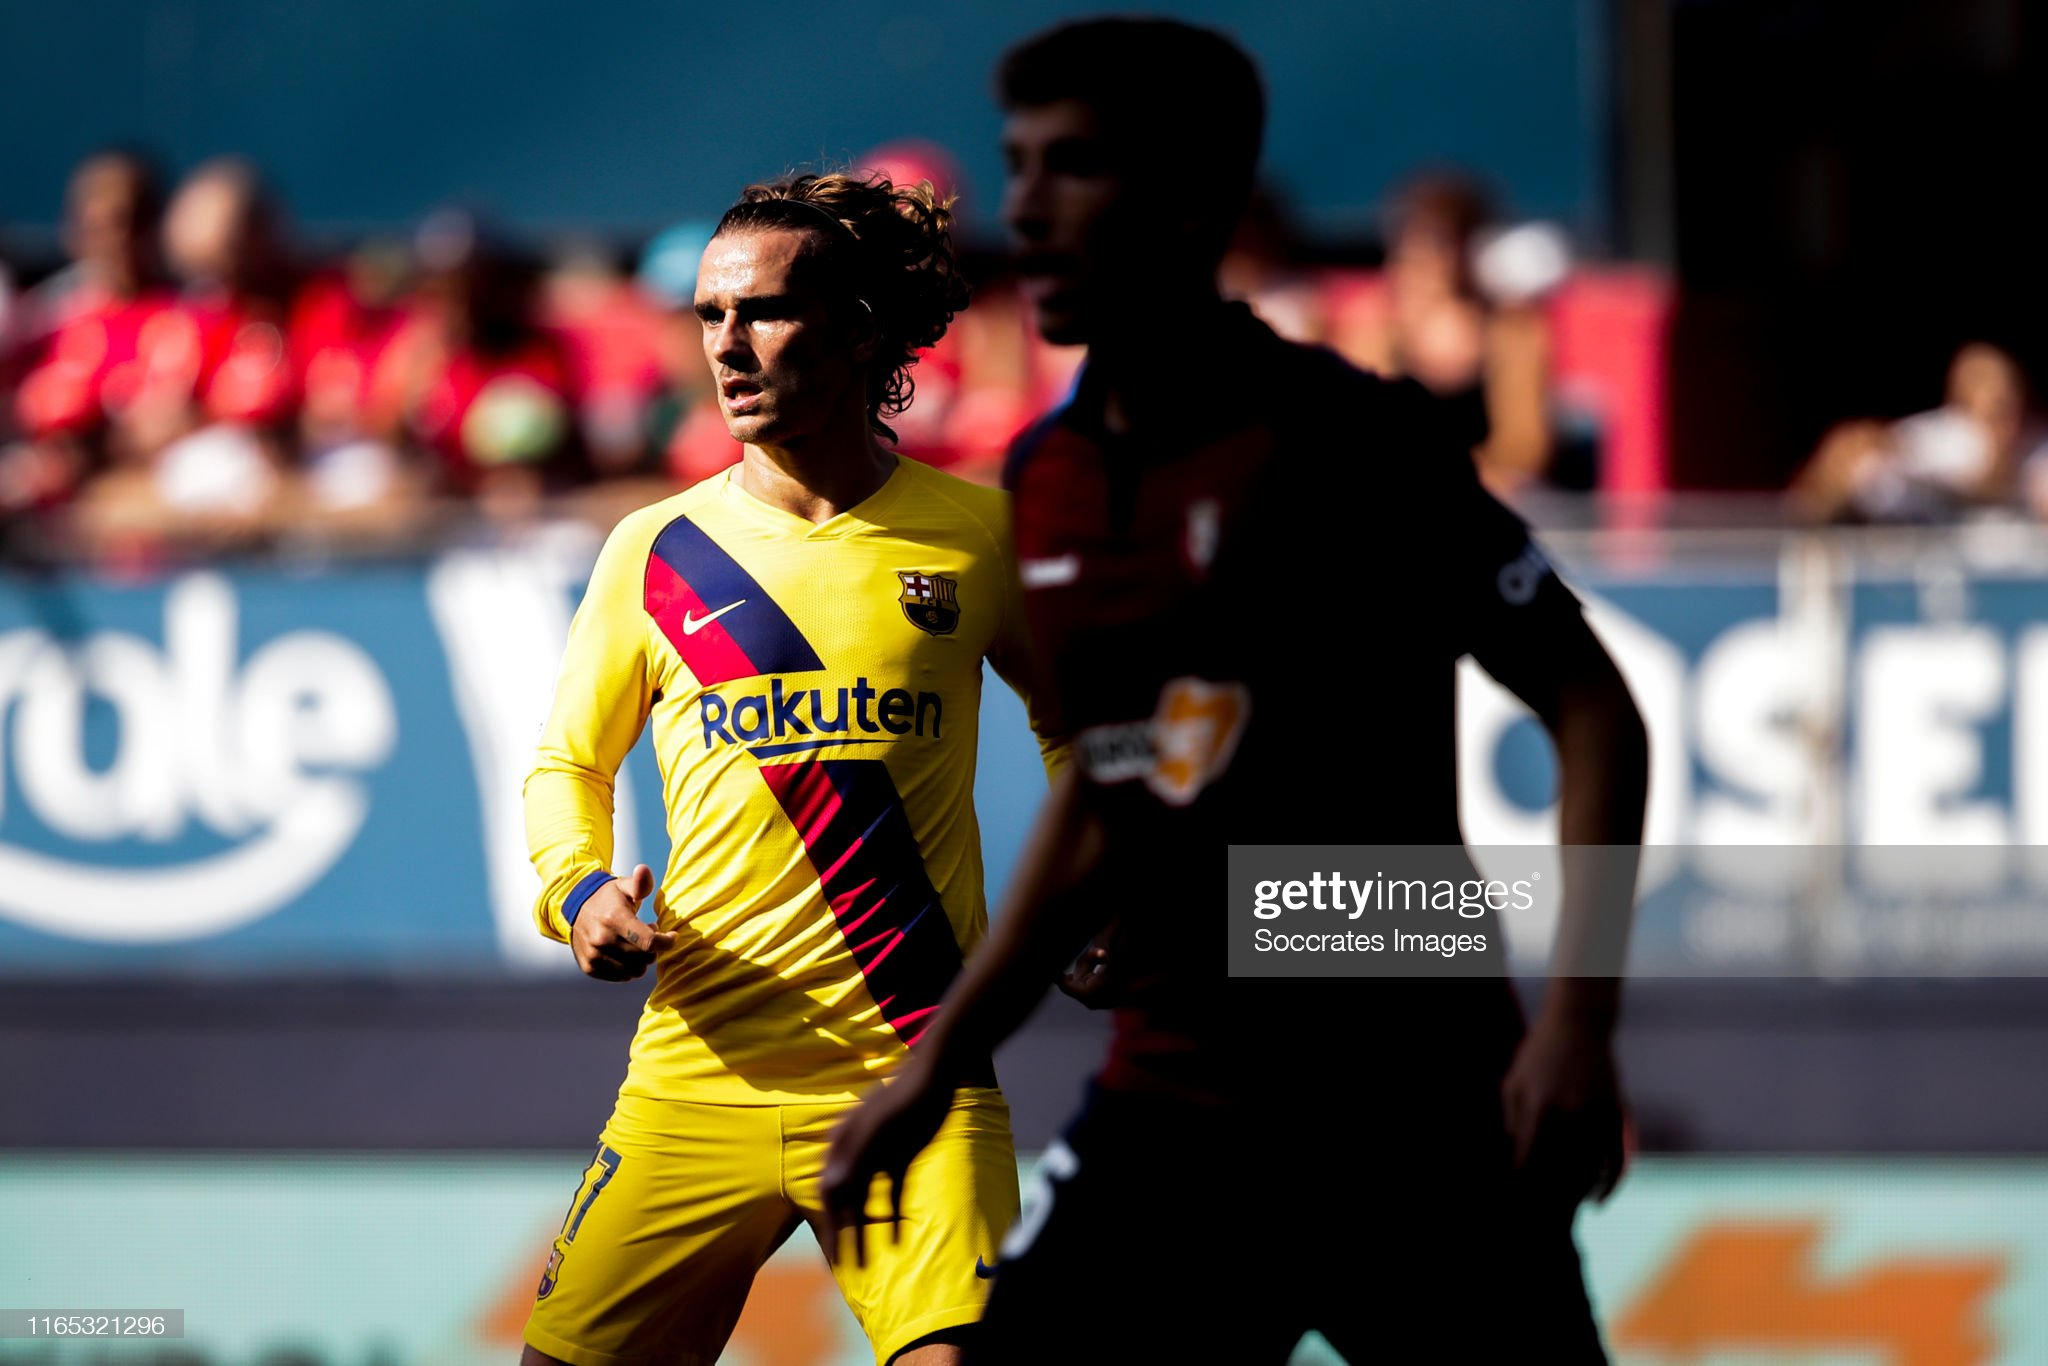 صور مباراة : أوساسونا - برشلونة 2-2 ( 31-08-2019 )  Antoine-griezmann-of-fc-barcelona-during-the-la-liga-santander-match-picture-id1165321296?s=2048x2048